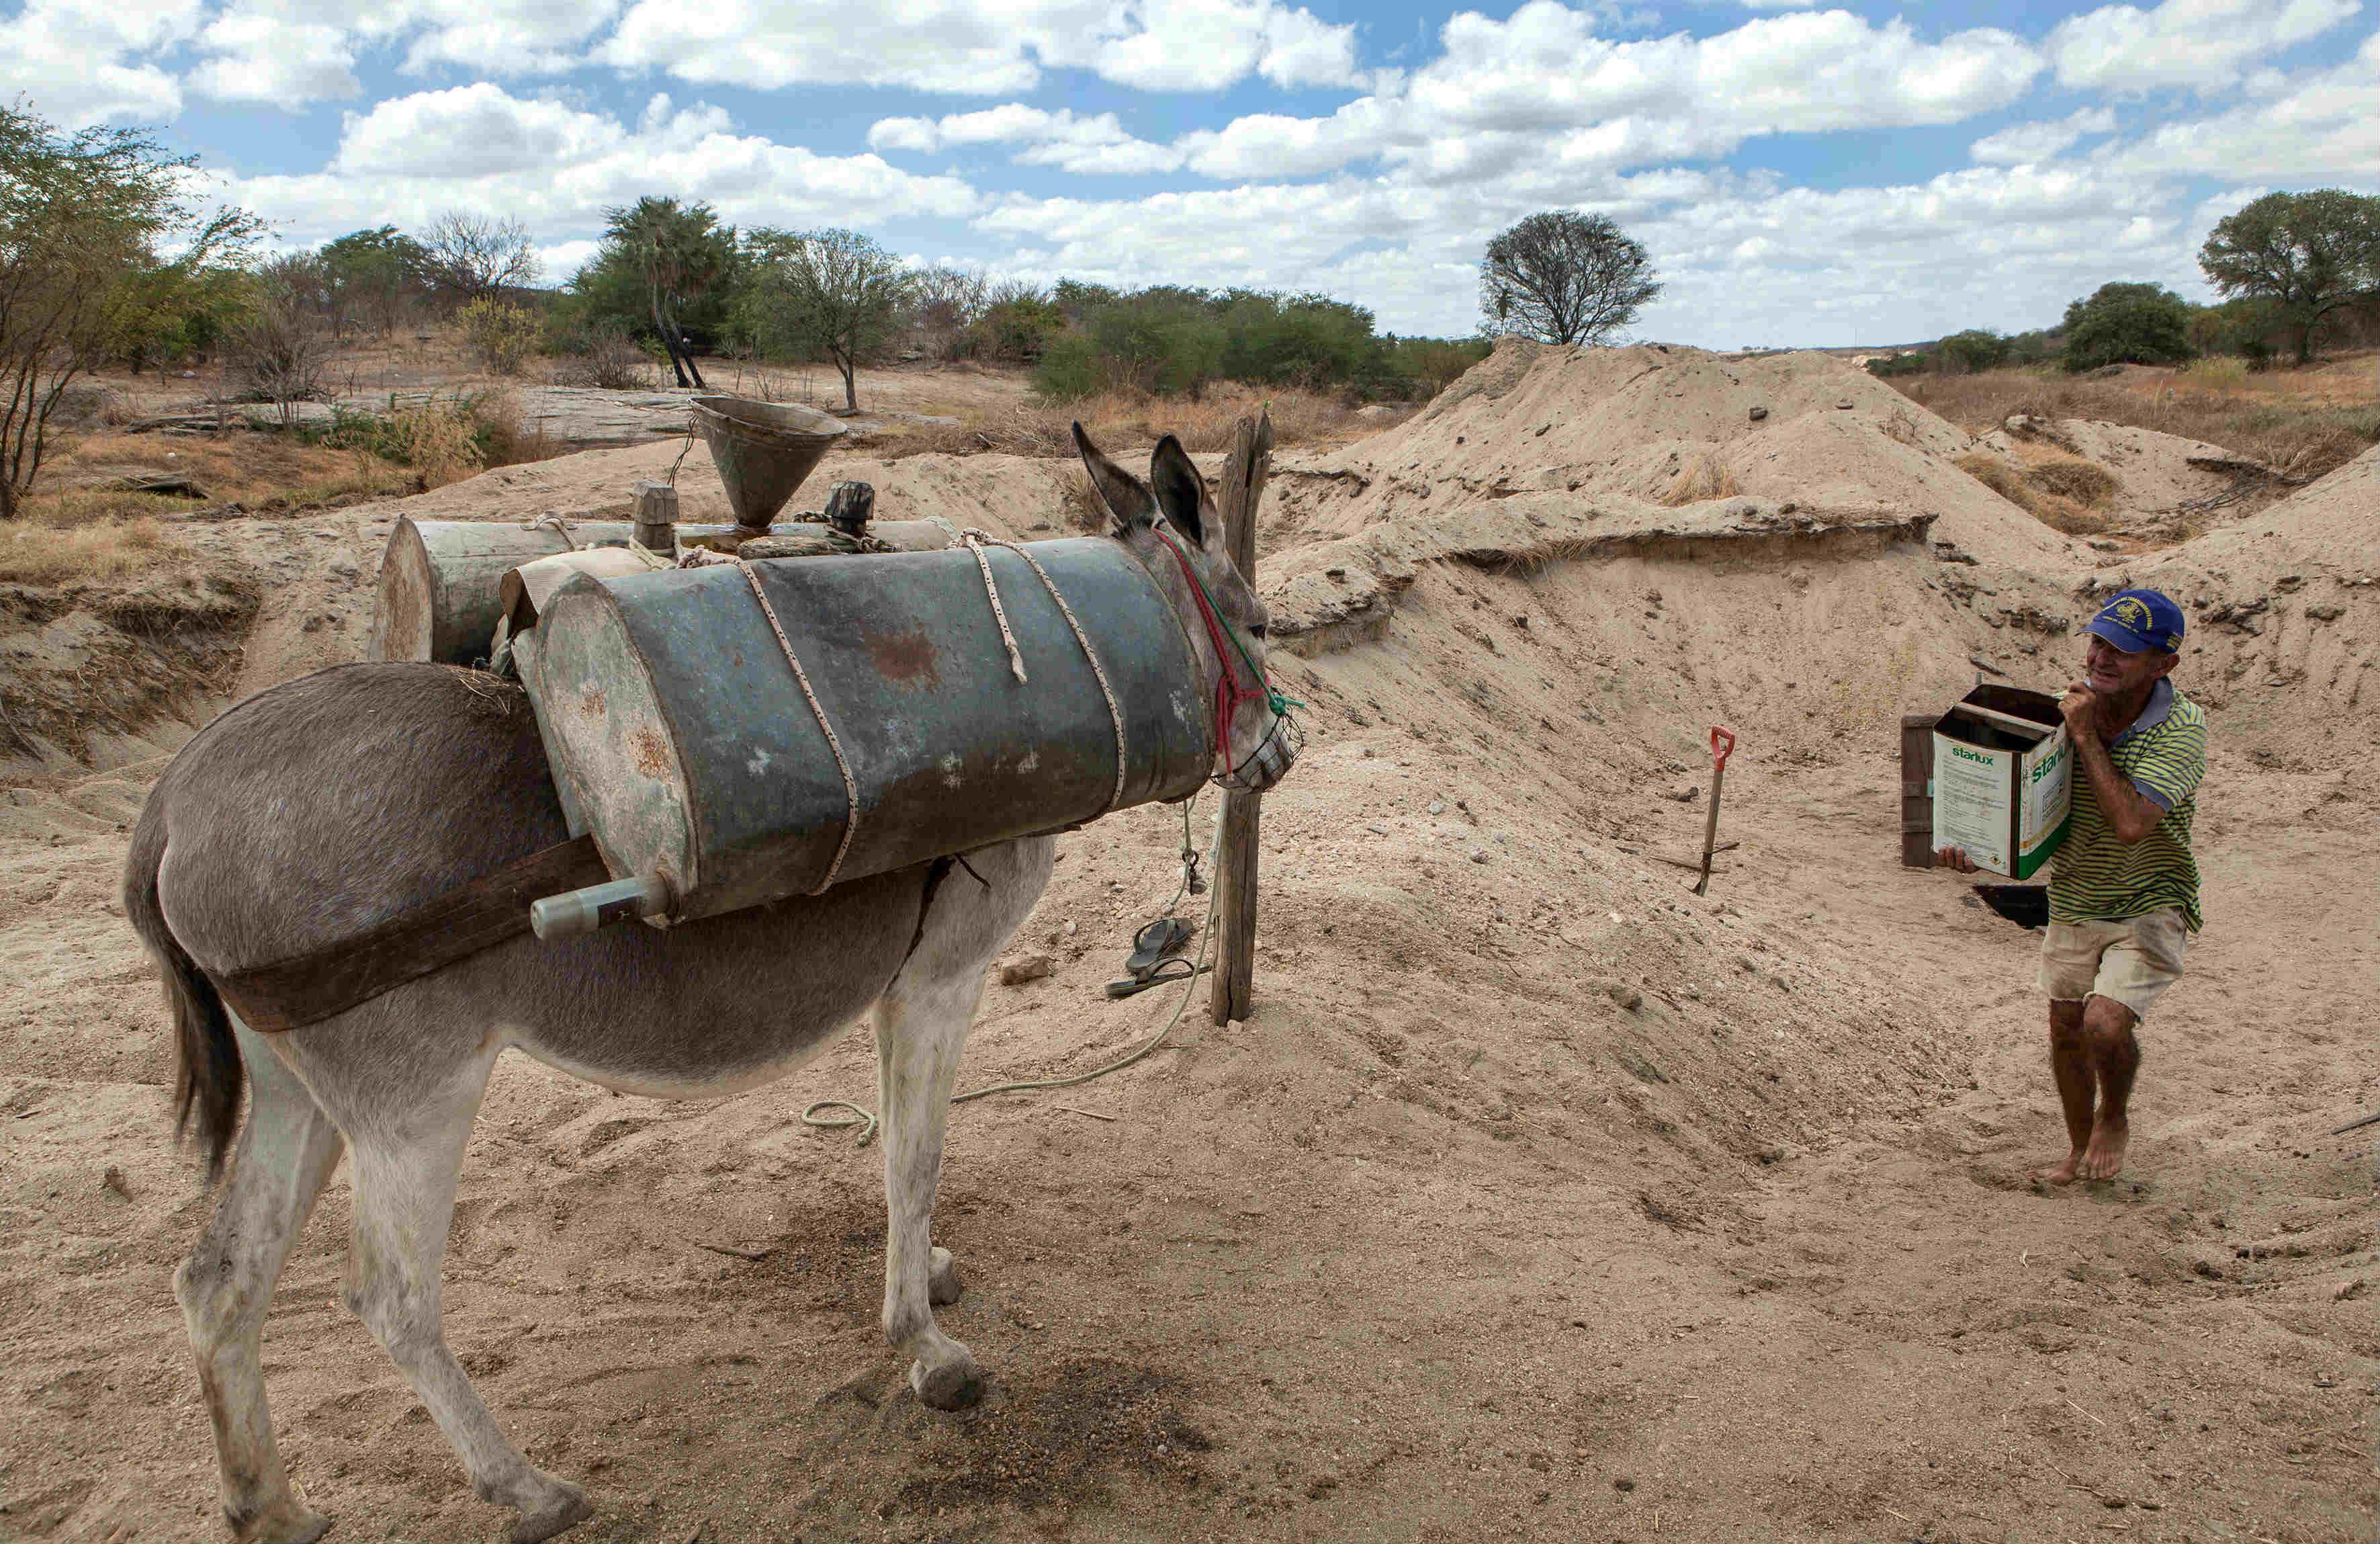 d871e51ba Morador retira água de poço cavado no leito seco do rio Seridó  contexto da  seca de da pobreza dificulta denúncias trabalhistas (Foto  Lilo Clareto)